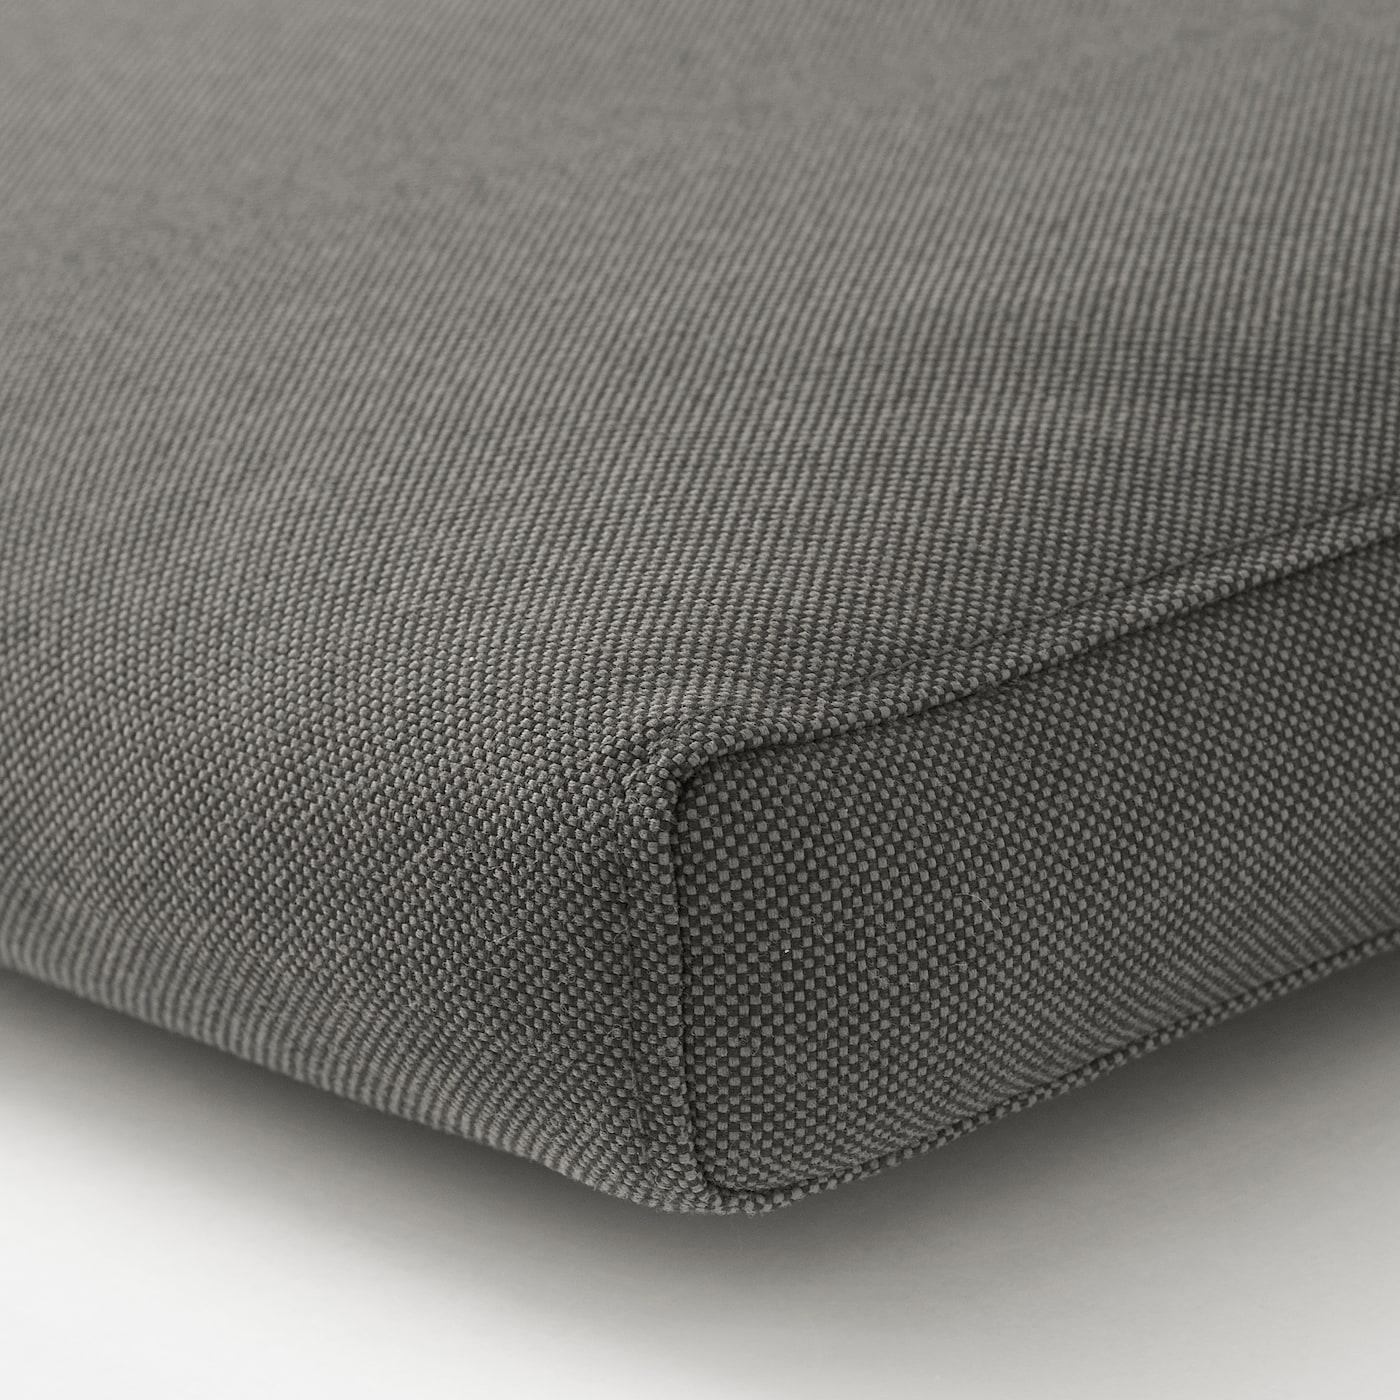 FRÖSÖN/DUVHOLMEN Sitz-/Rückenpolster/außen, dunkelgrau, 116x45 cm